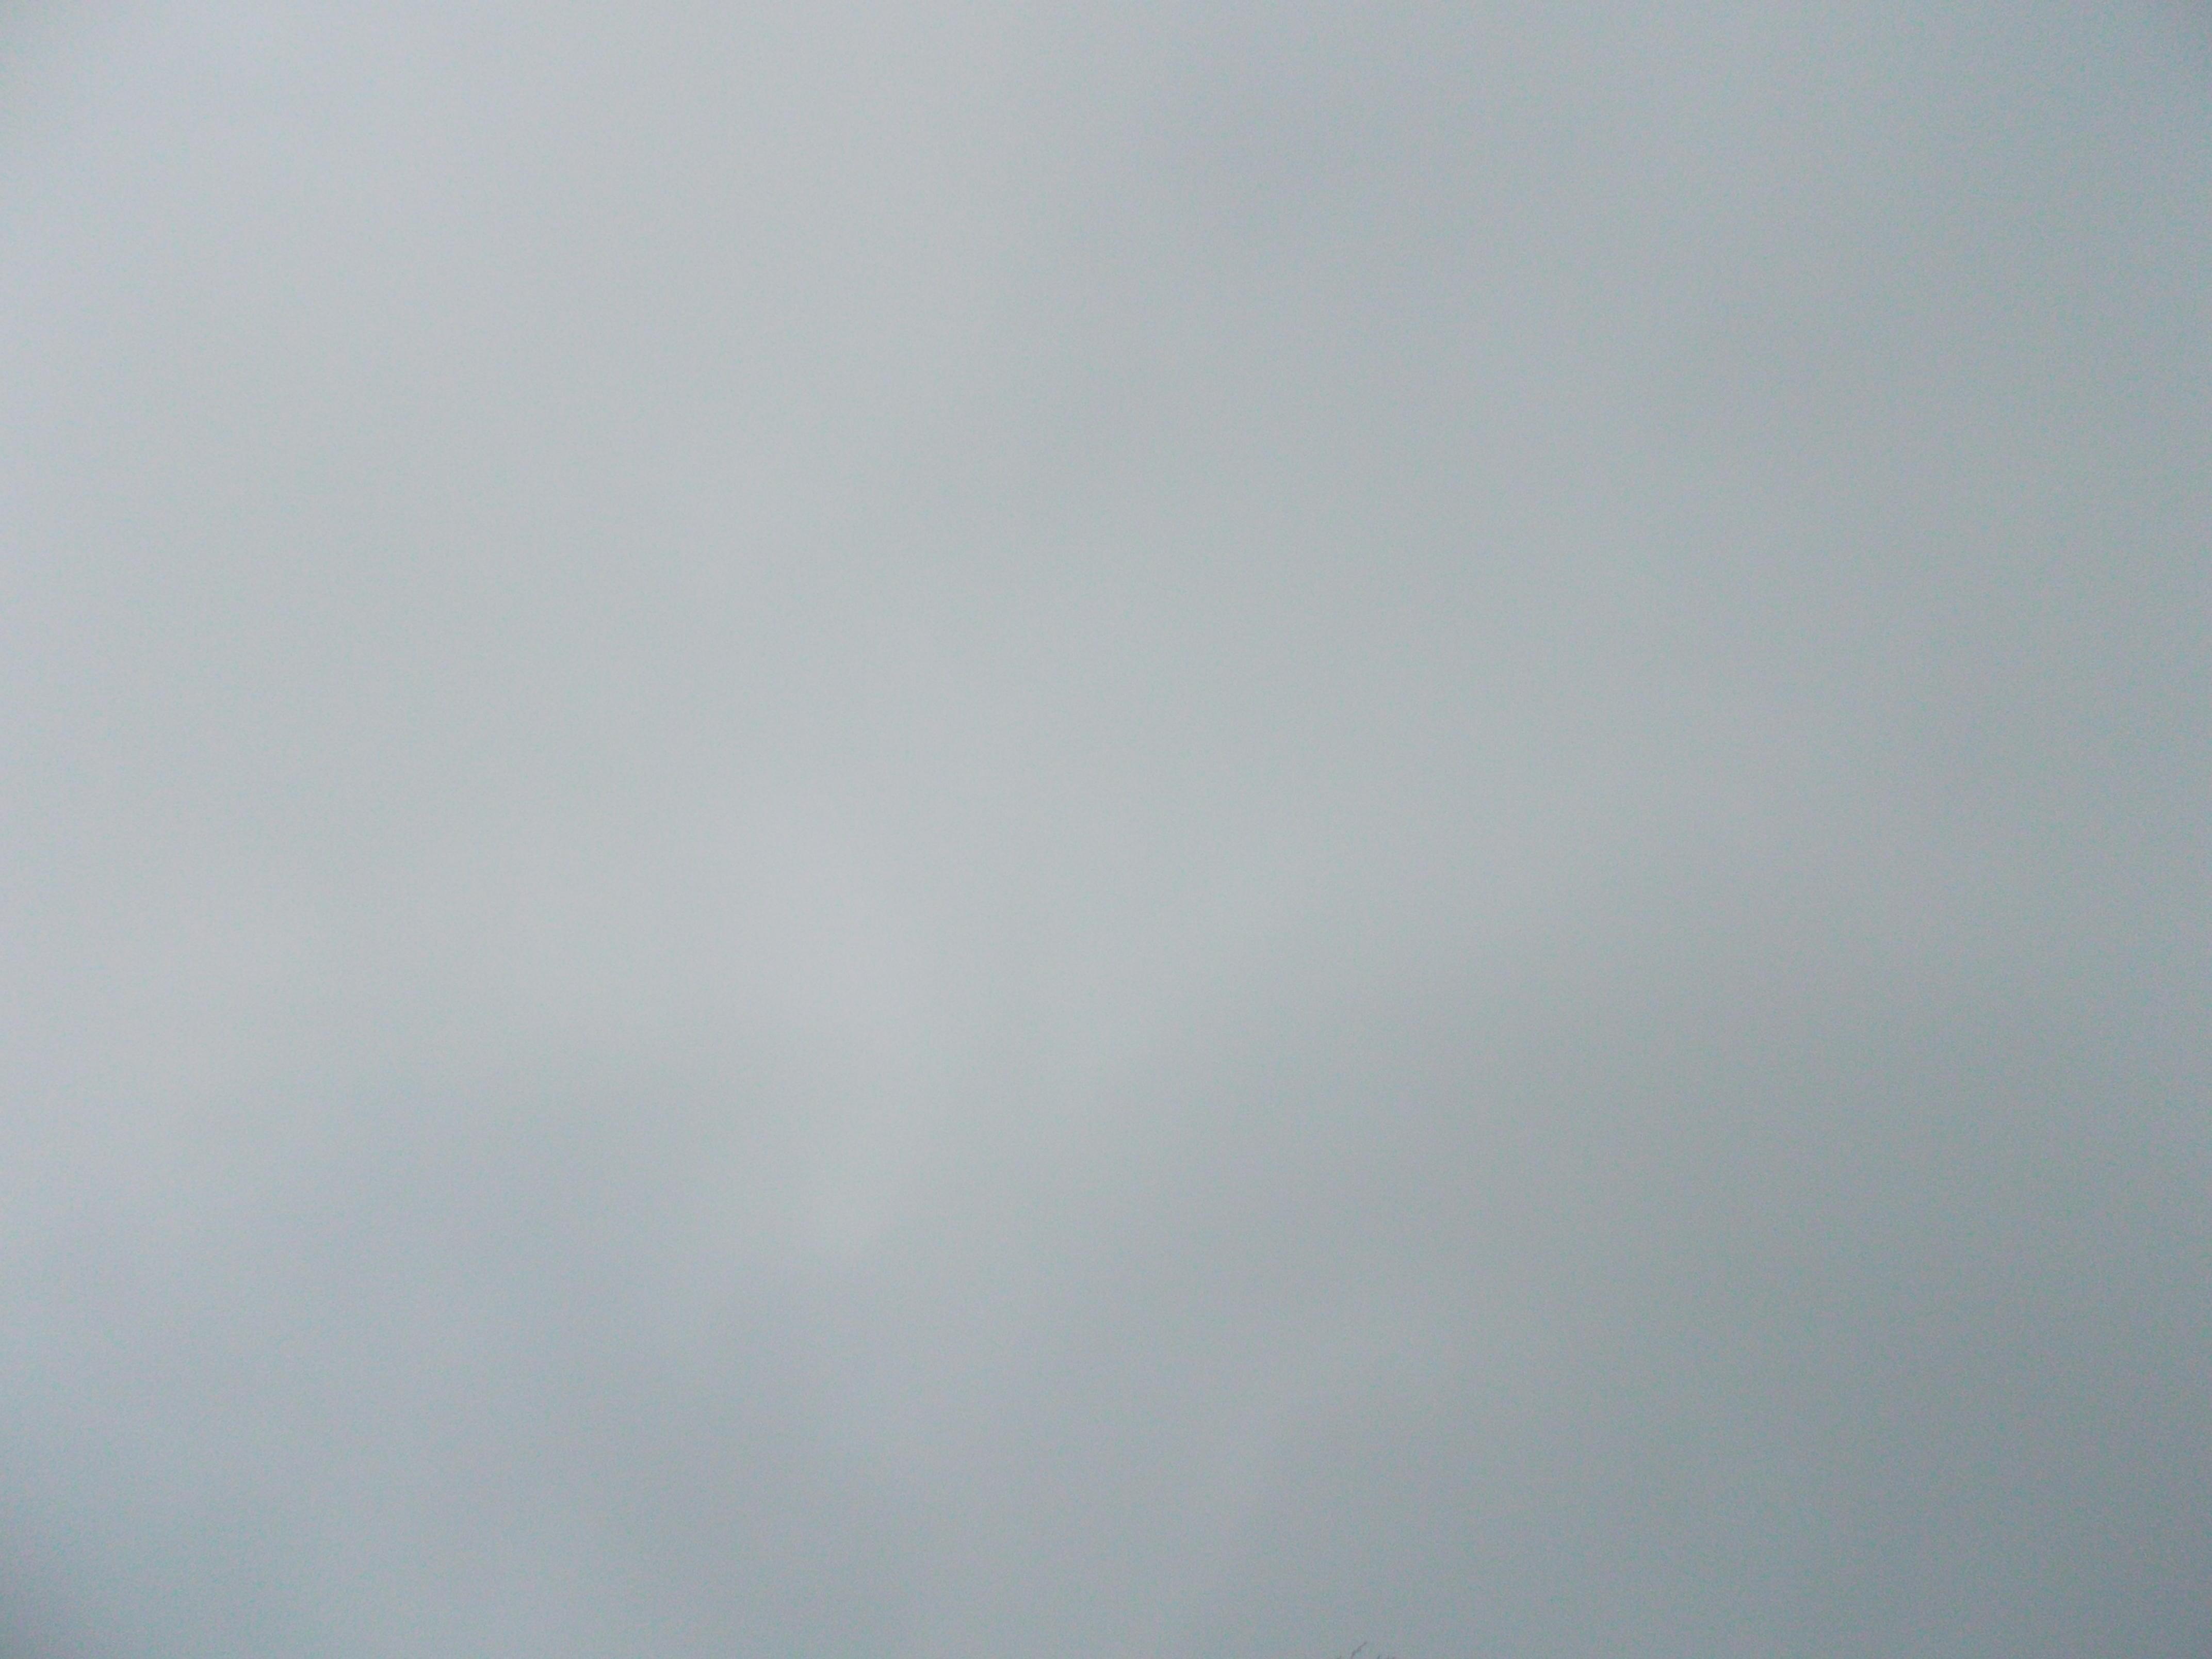 2013-03-24 Longitude -0.371 Latitude 49.182 Altitude 29 Heure 13h24